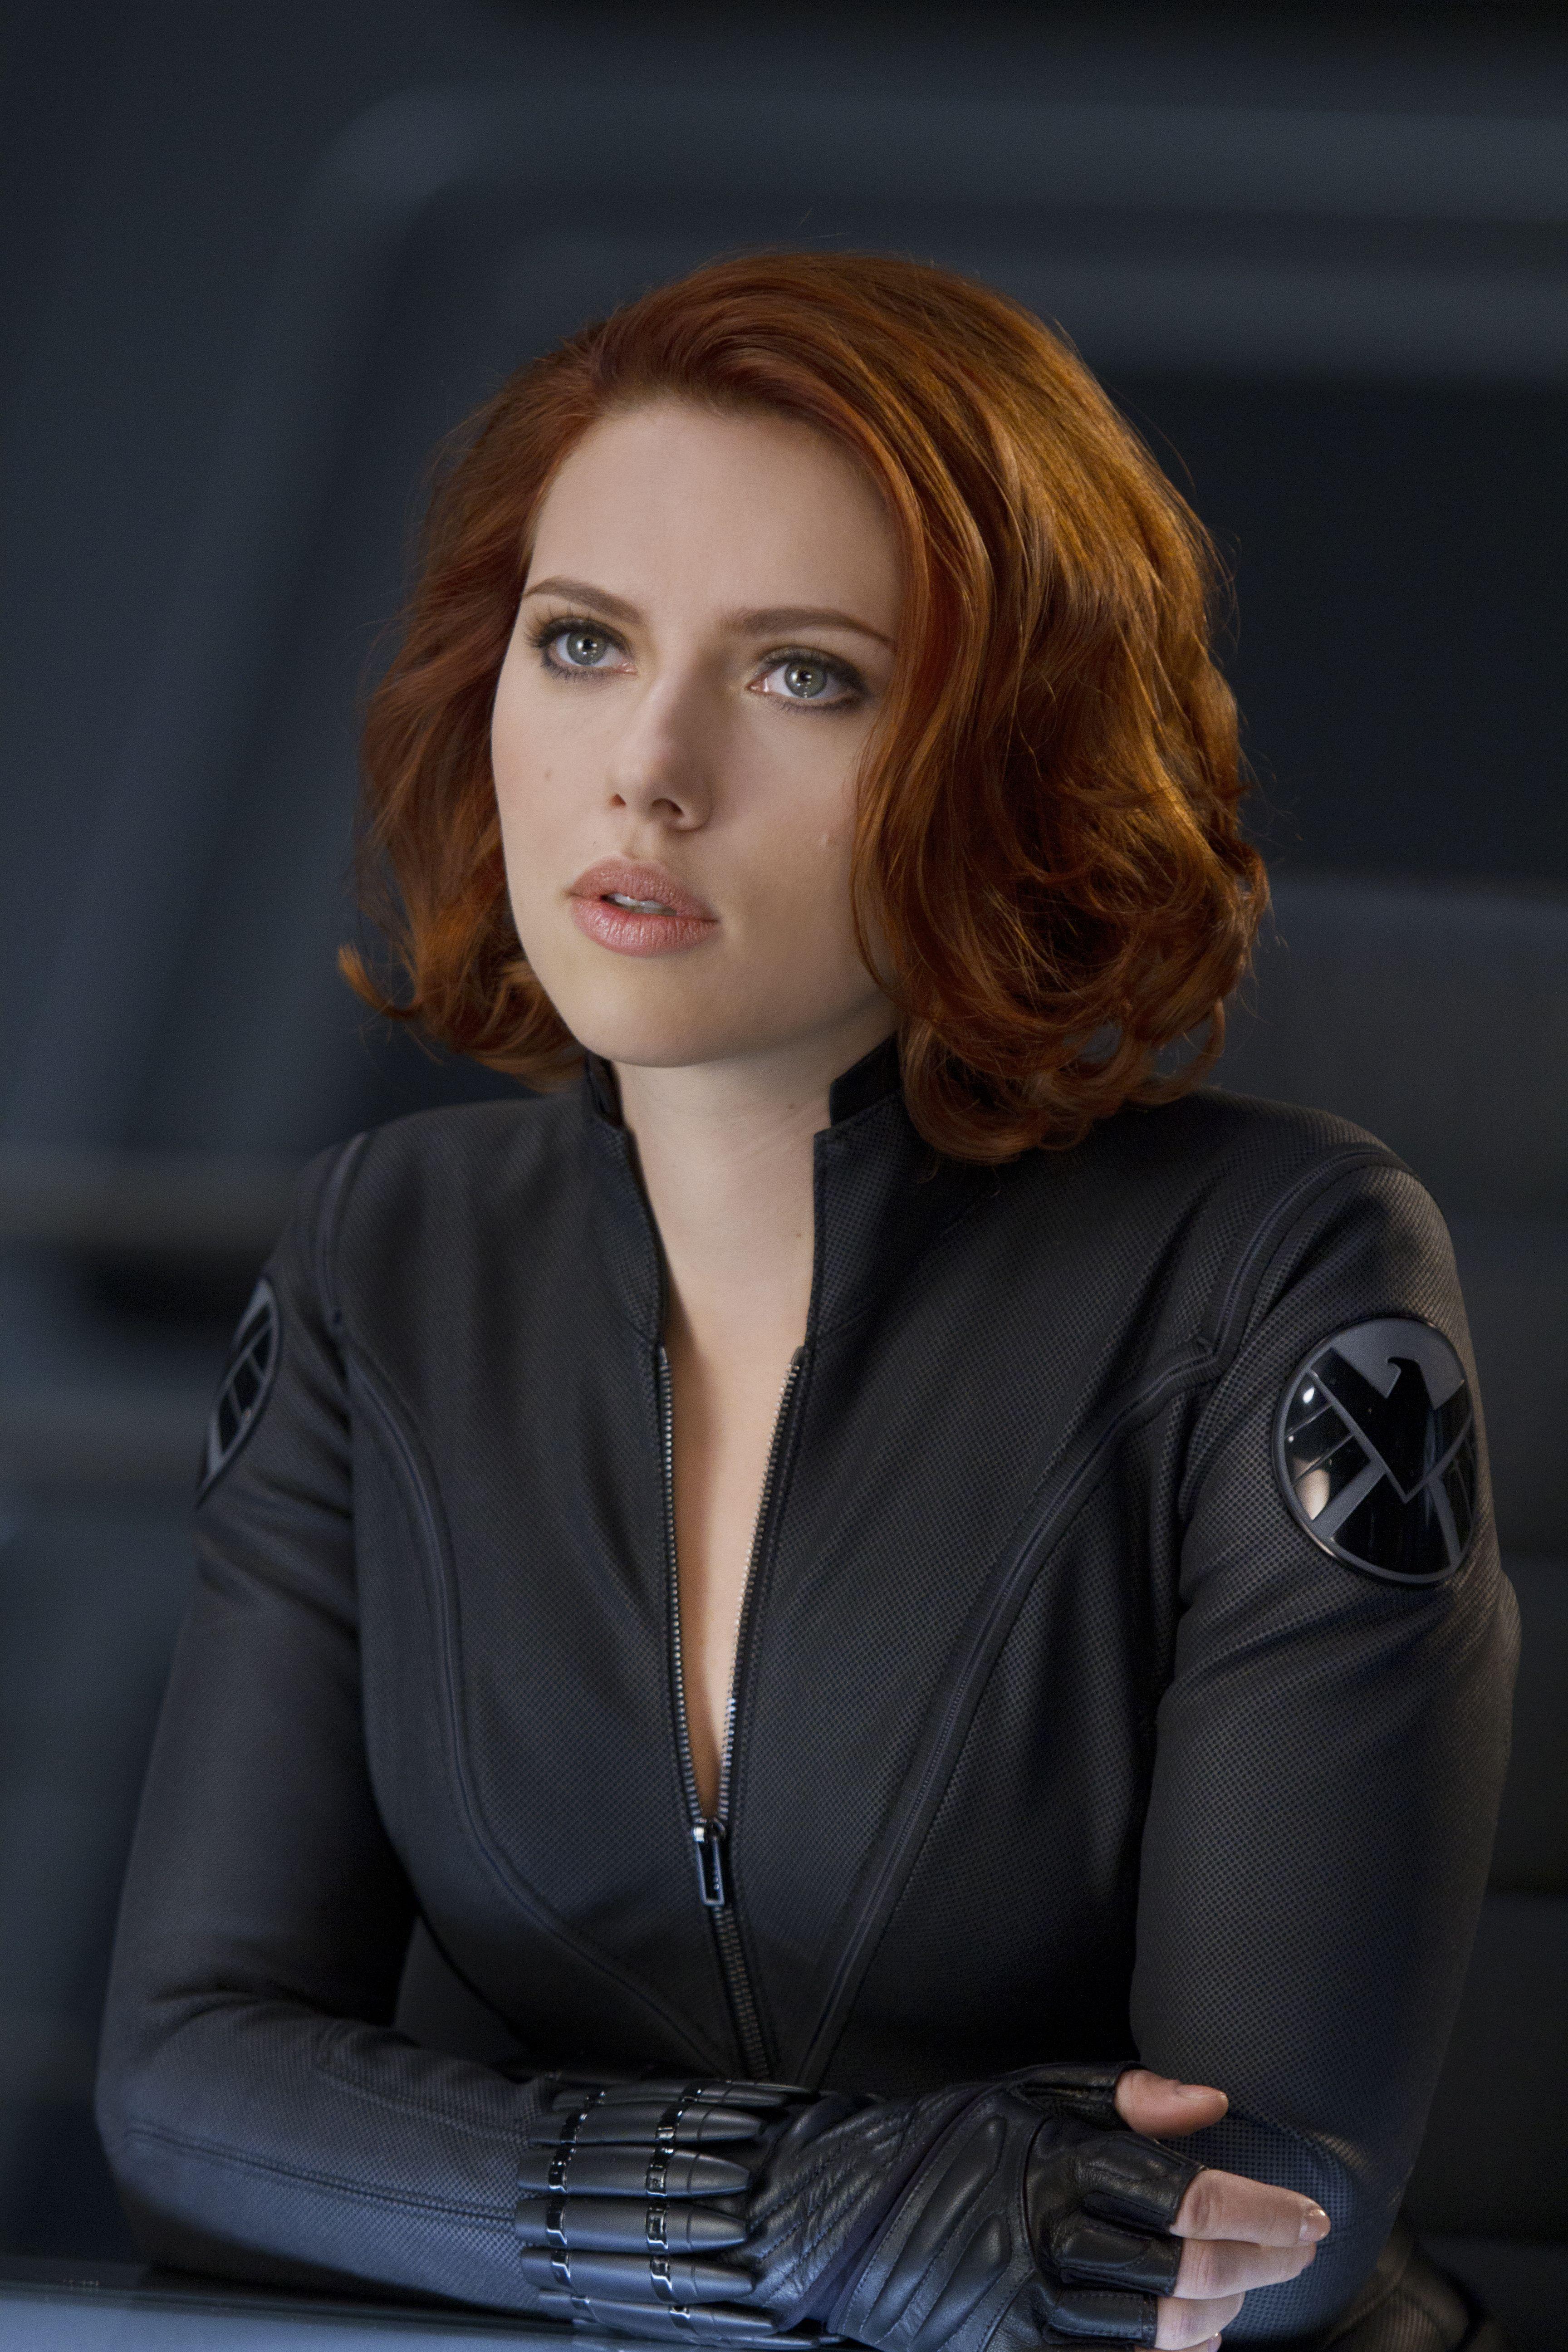 Avengers Age Of Ultron Scarlett Johansson On Black